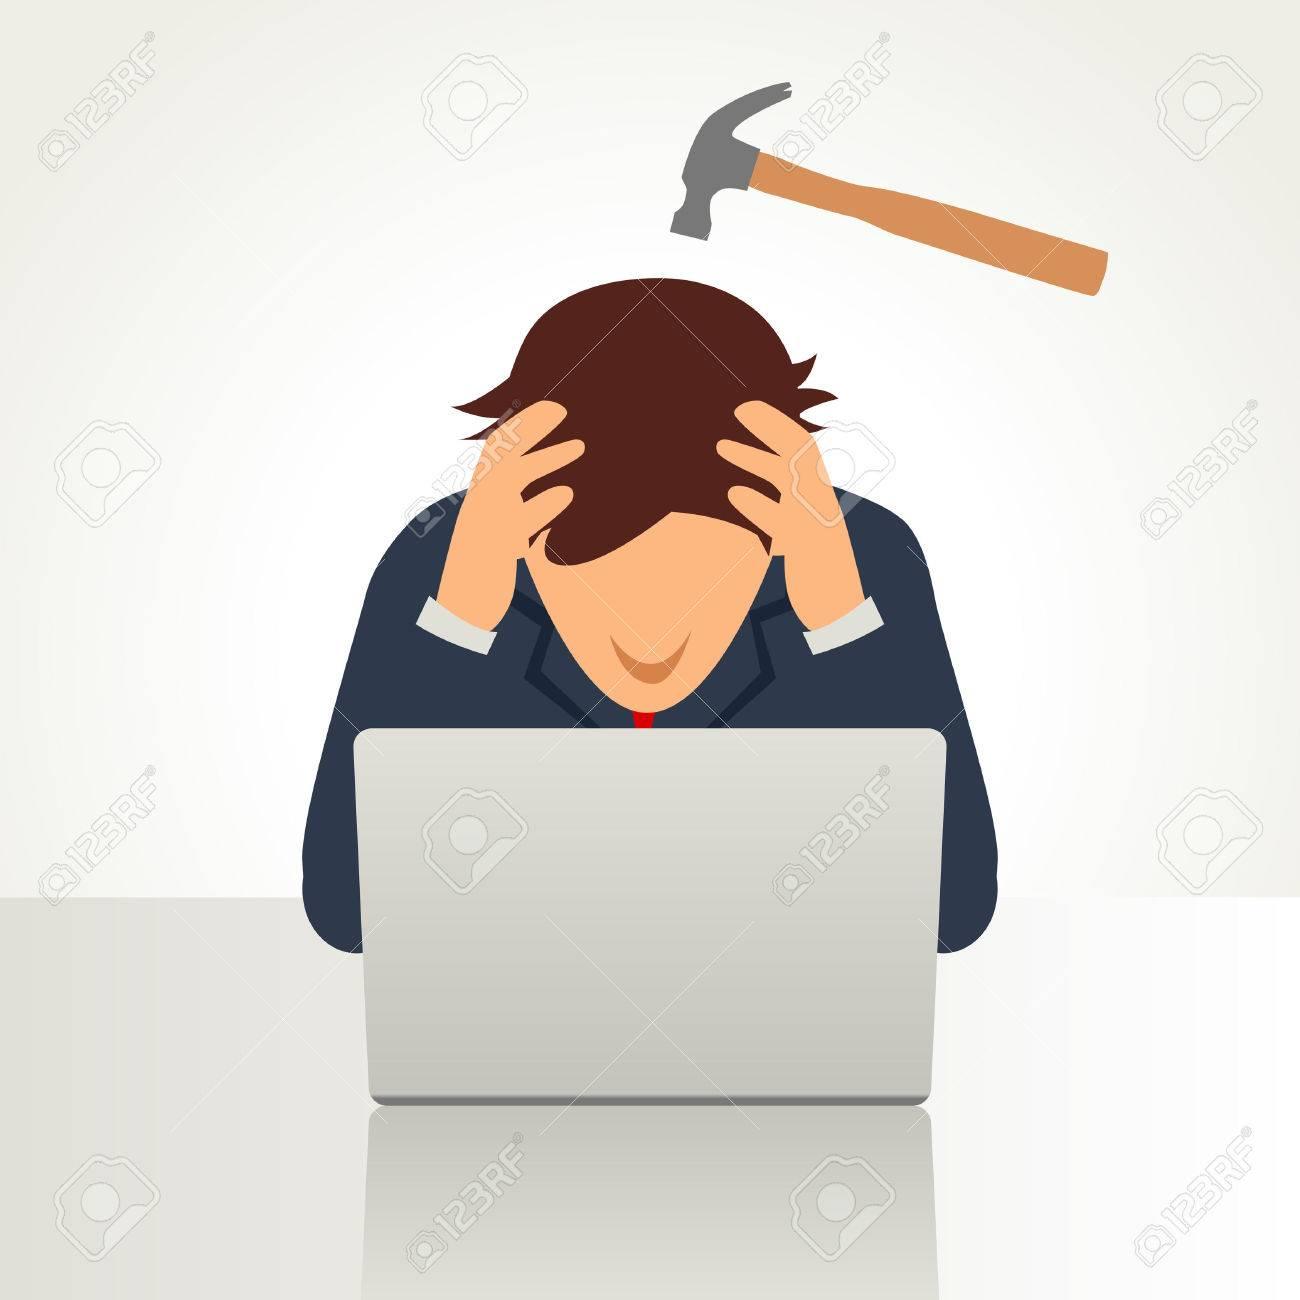 Simple cartoon of a businessman having a headache symbolize by a hammer on his head - 50934588